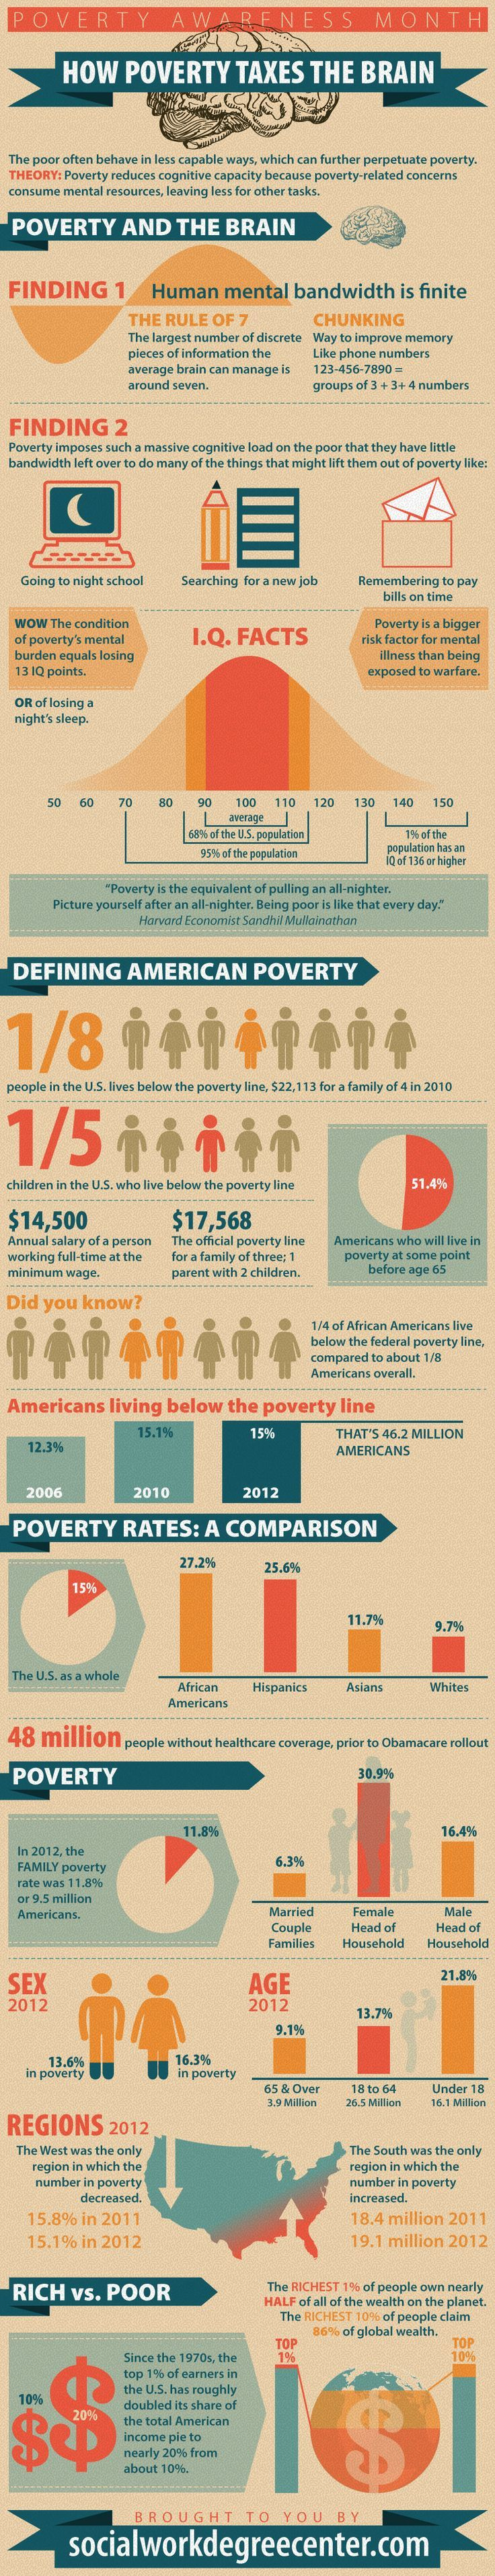 Poverty Taxes the Brain - Socioeconomics in the Classroom